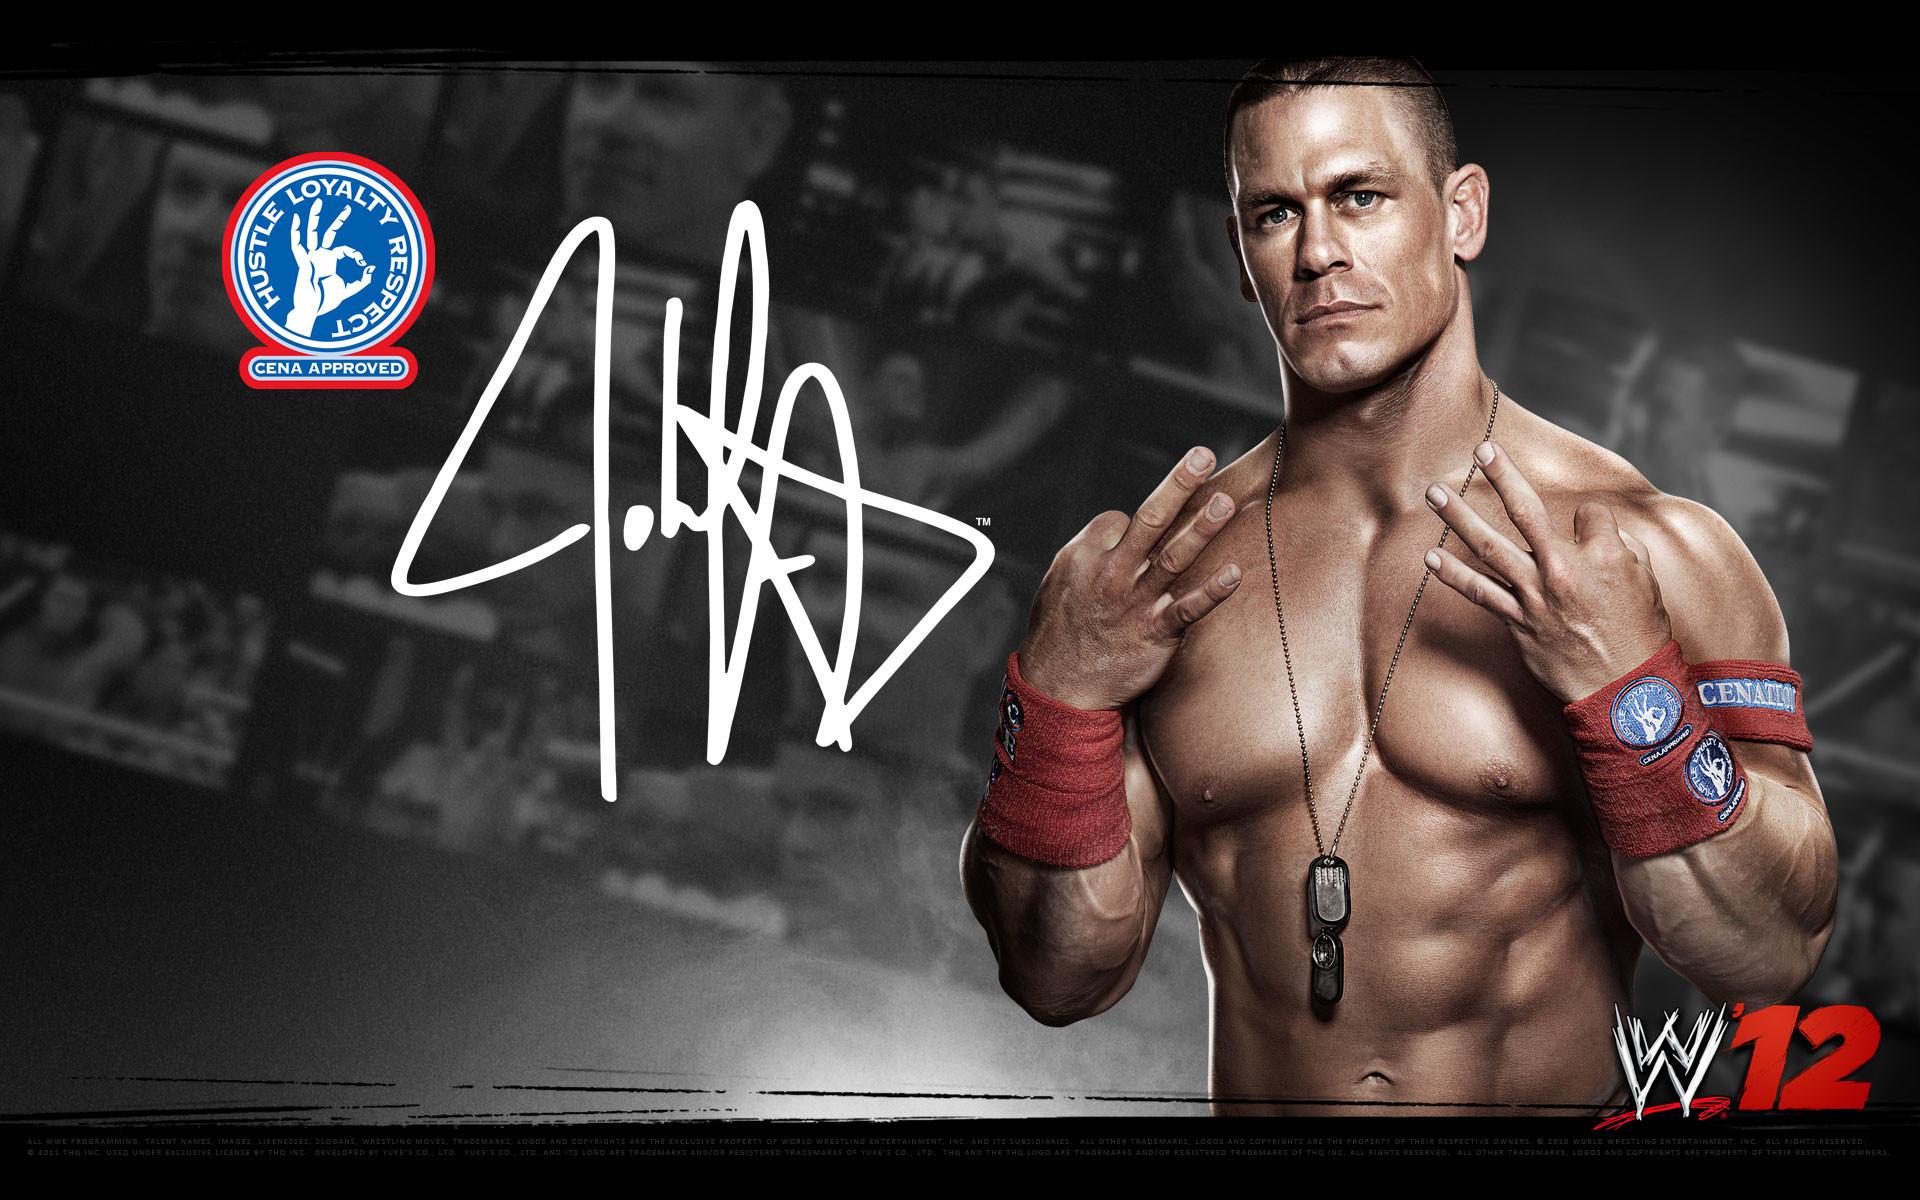 Wwe Superstar John Cena Wallpapers ①